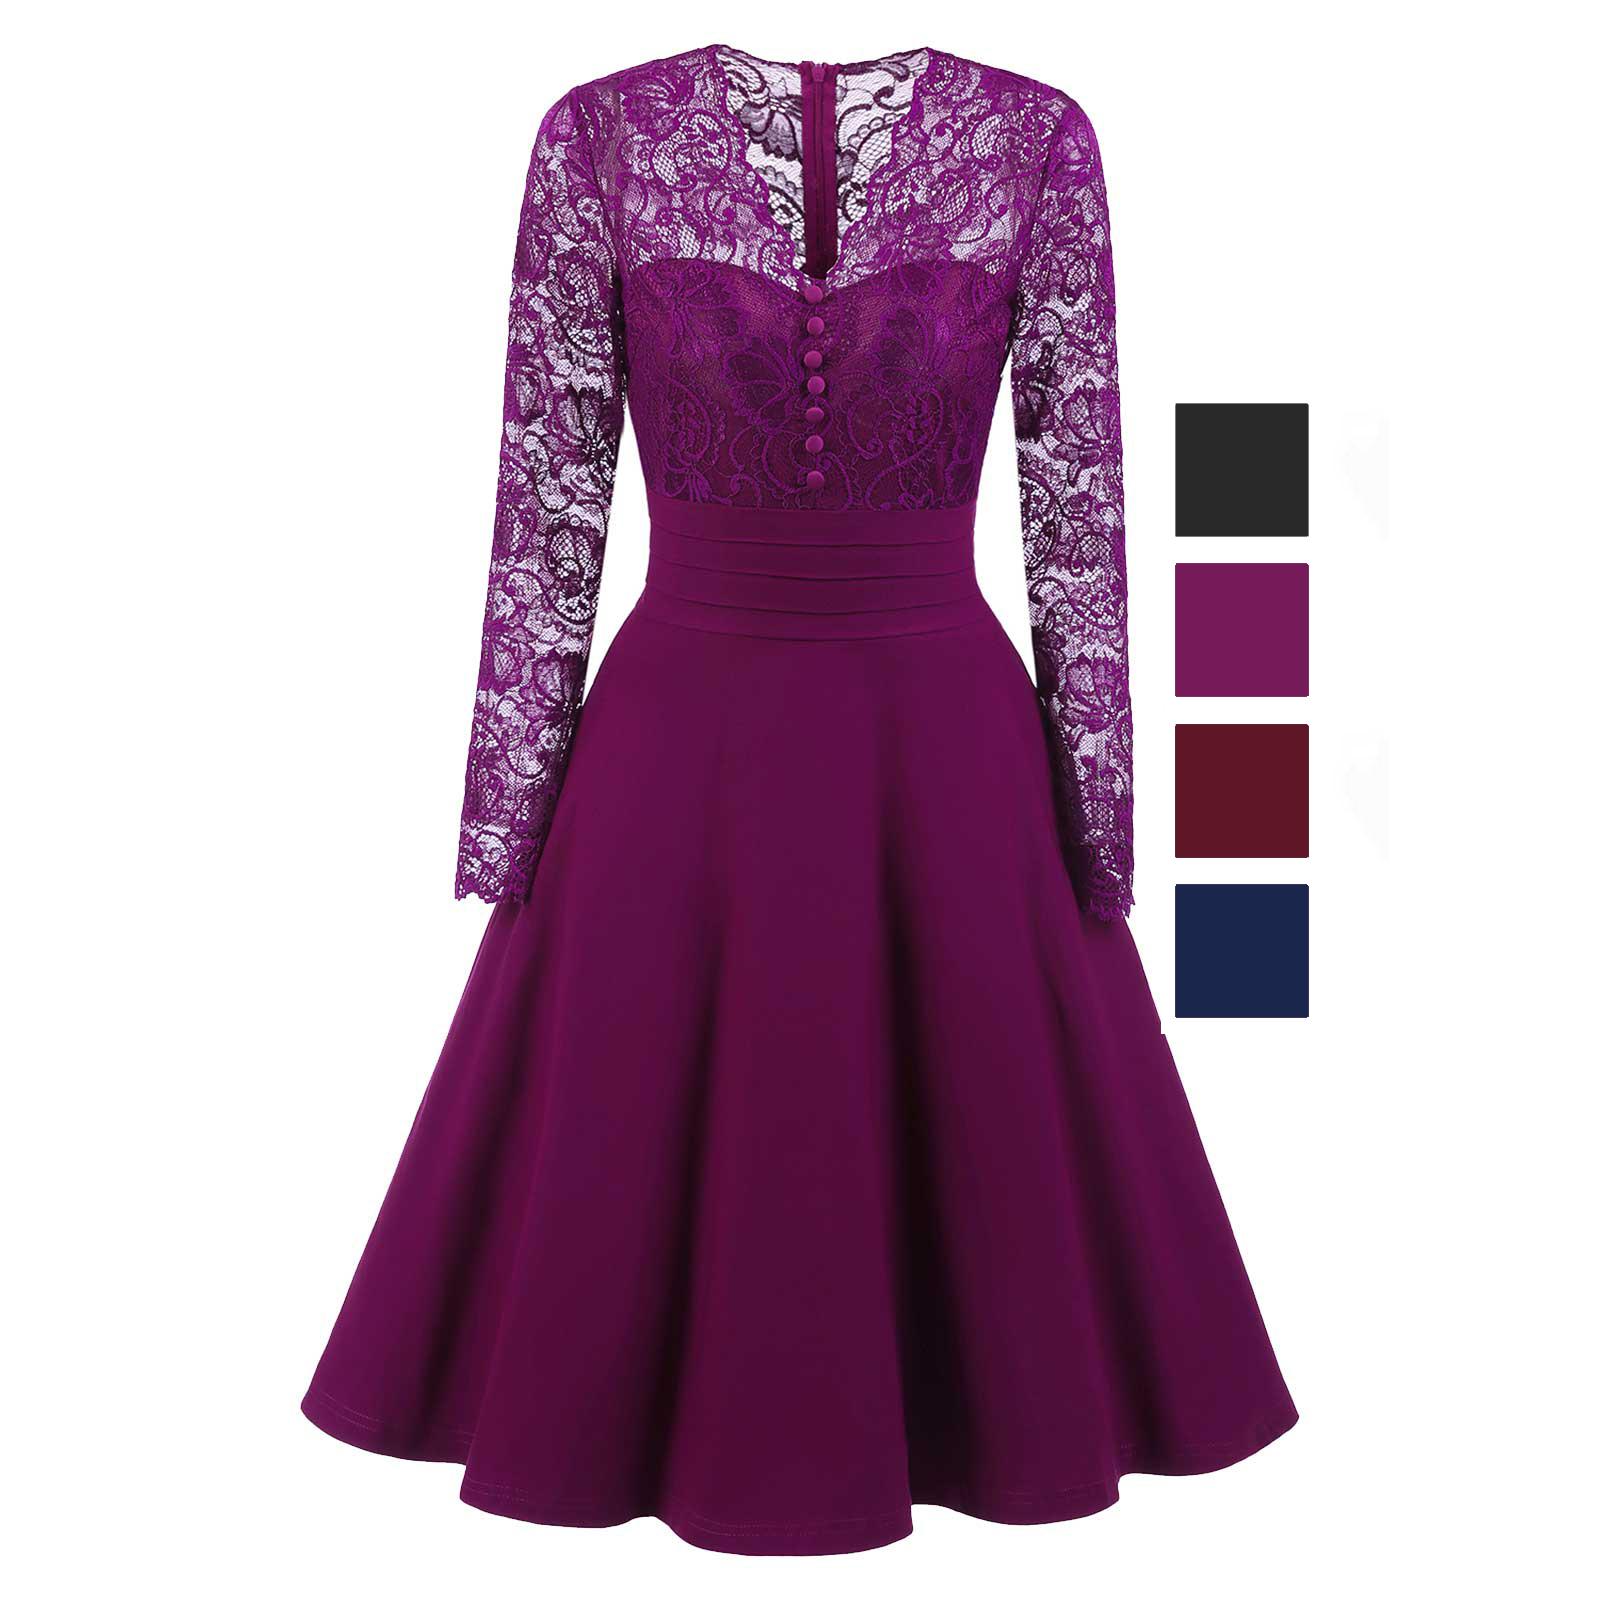 eda92ed295a A-line Midi Lace Corset Fashion Cocktail Prom Evening Dress ...